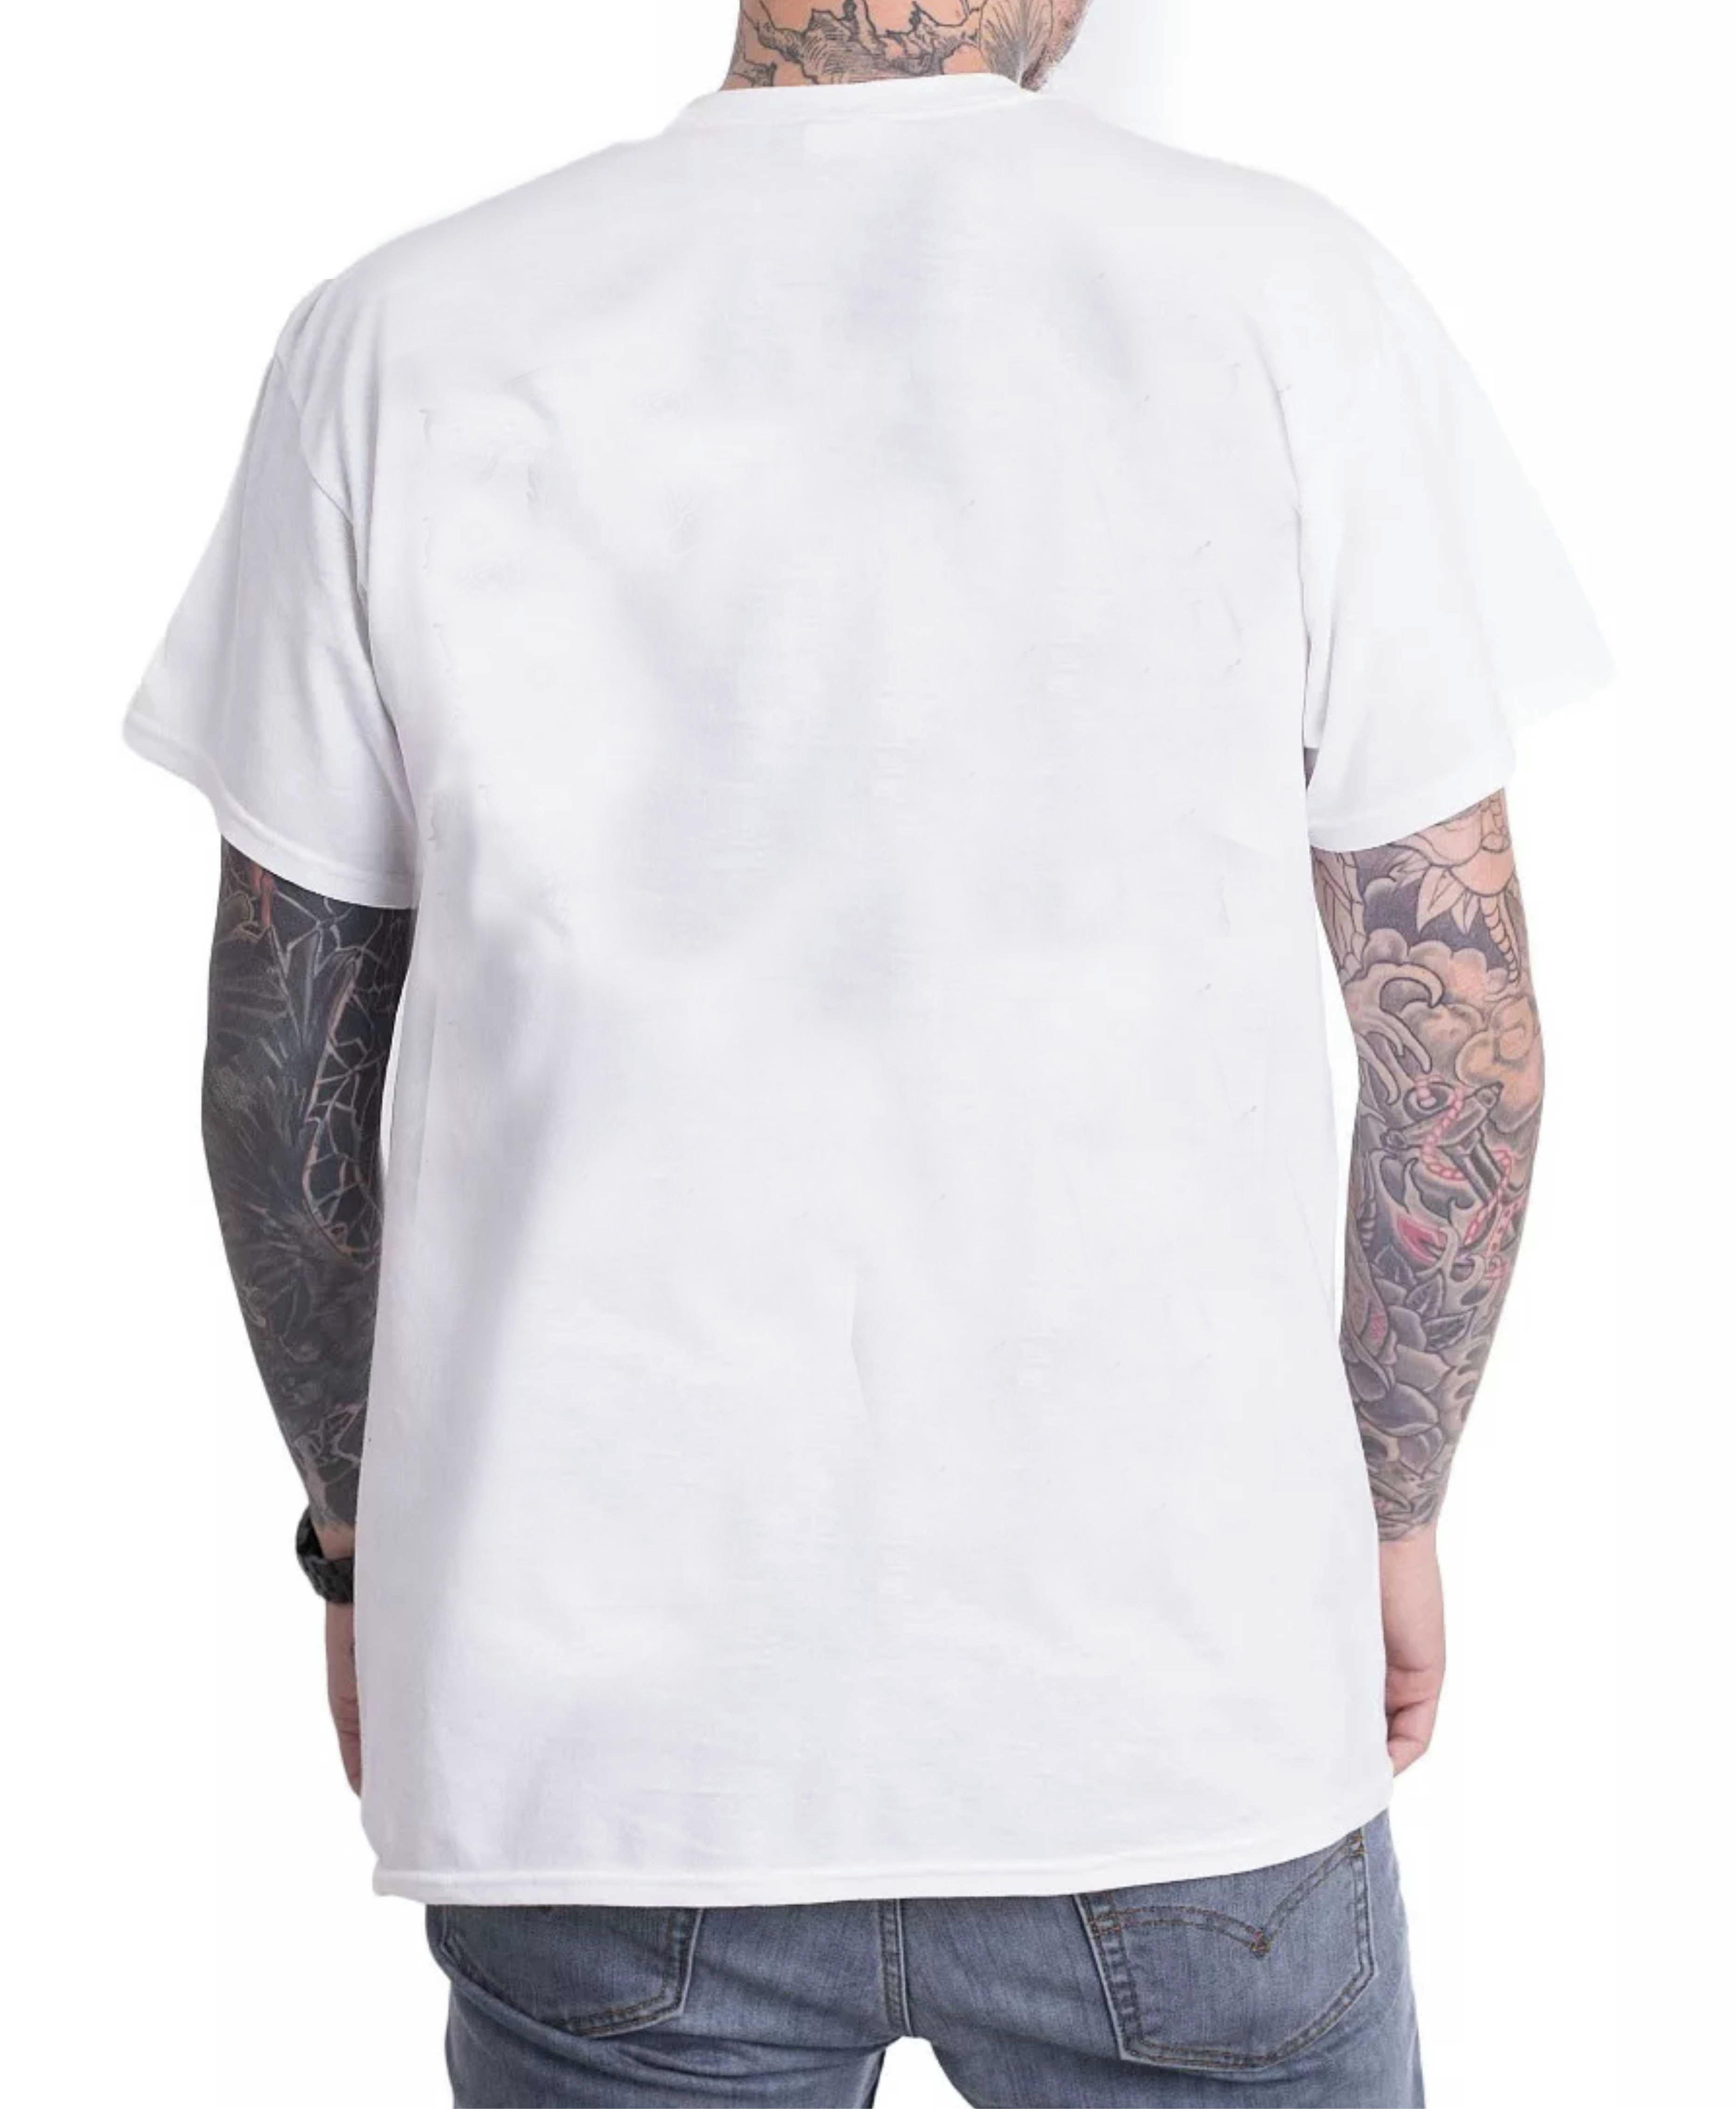 c5dd9b69d Camiseta Camisa Personalizada Esporte Basquete Nba 01 no Elo7 ...